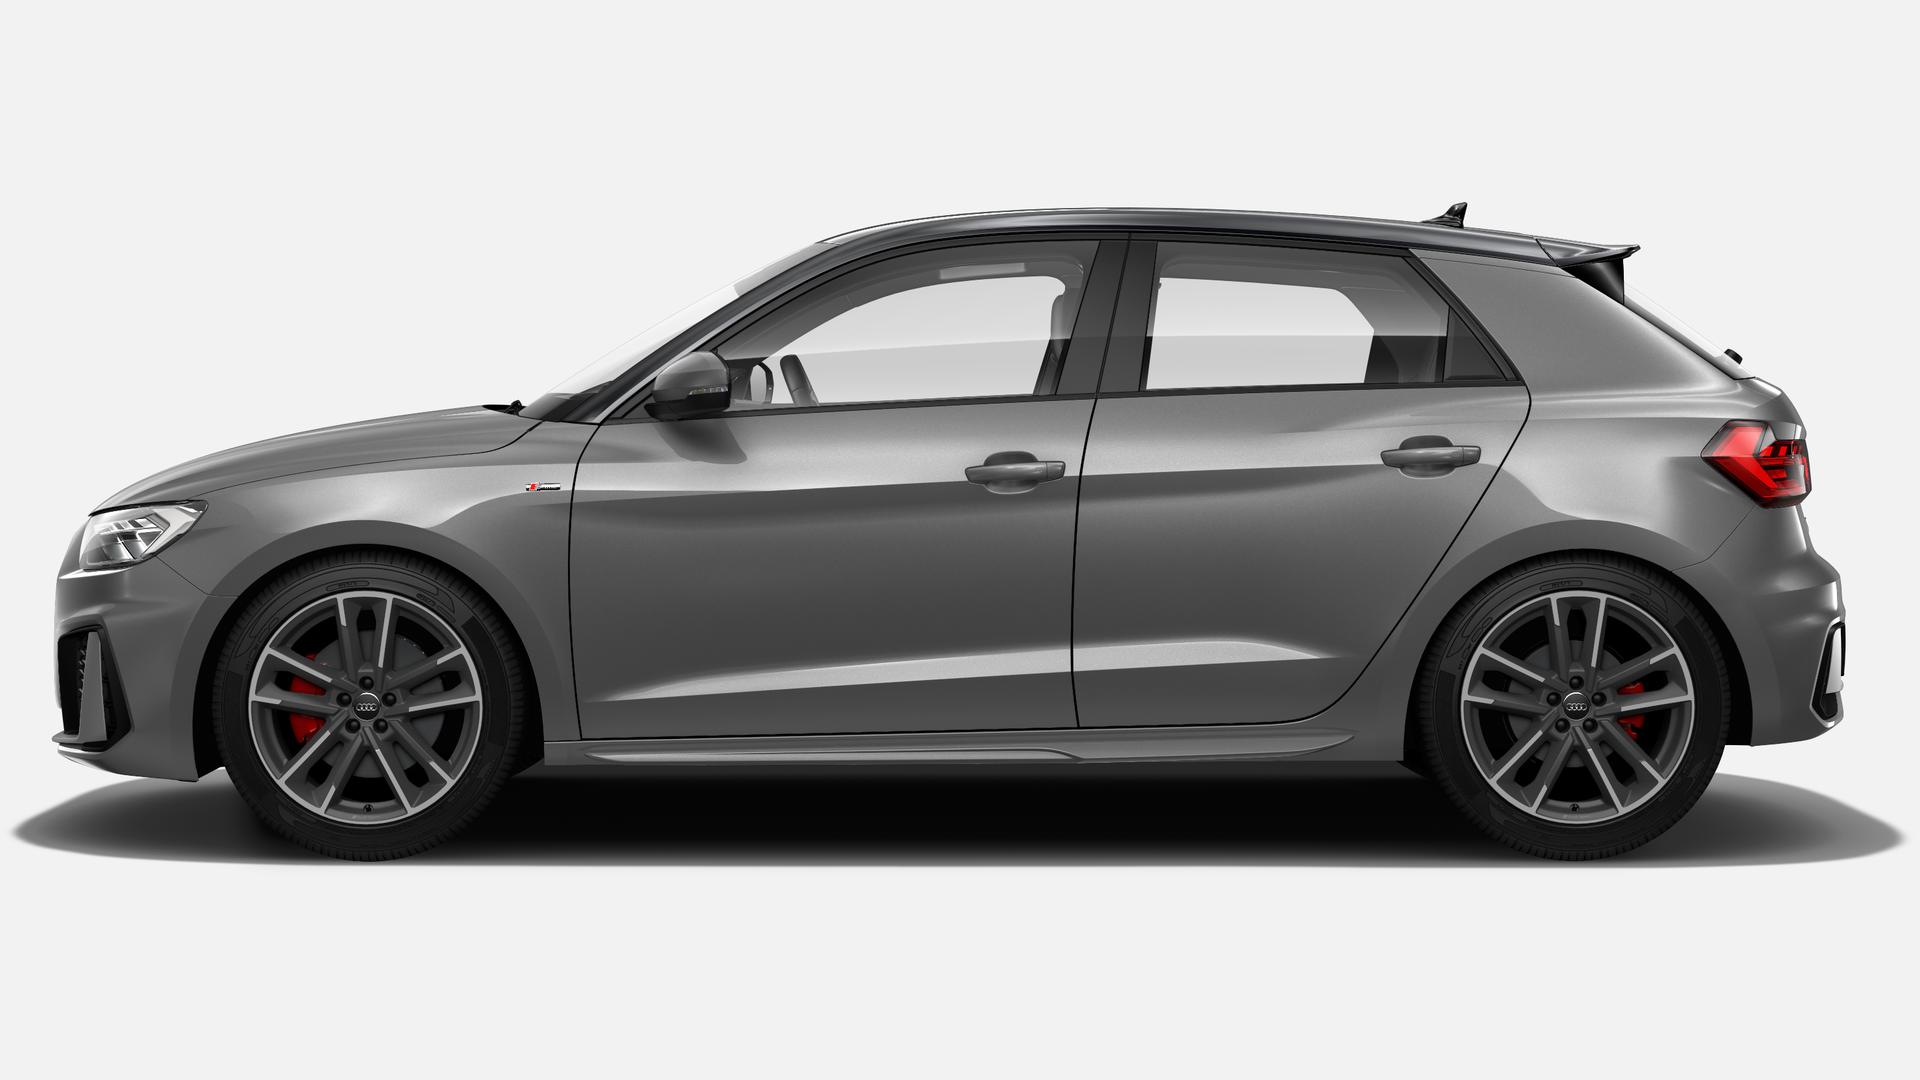 Vista Lateral izquierda de Audi A1 Sportback 30 TFSI S Line  85 kW (116 CV)